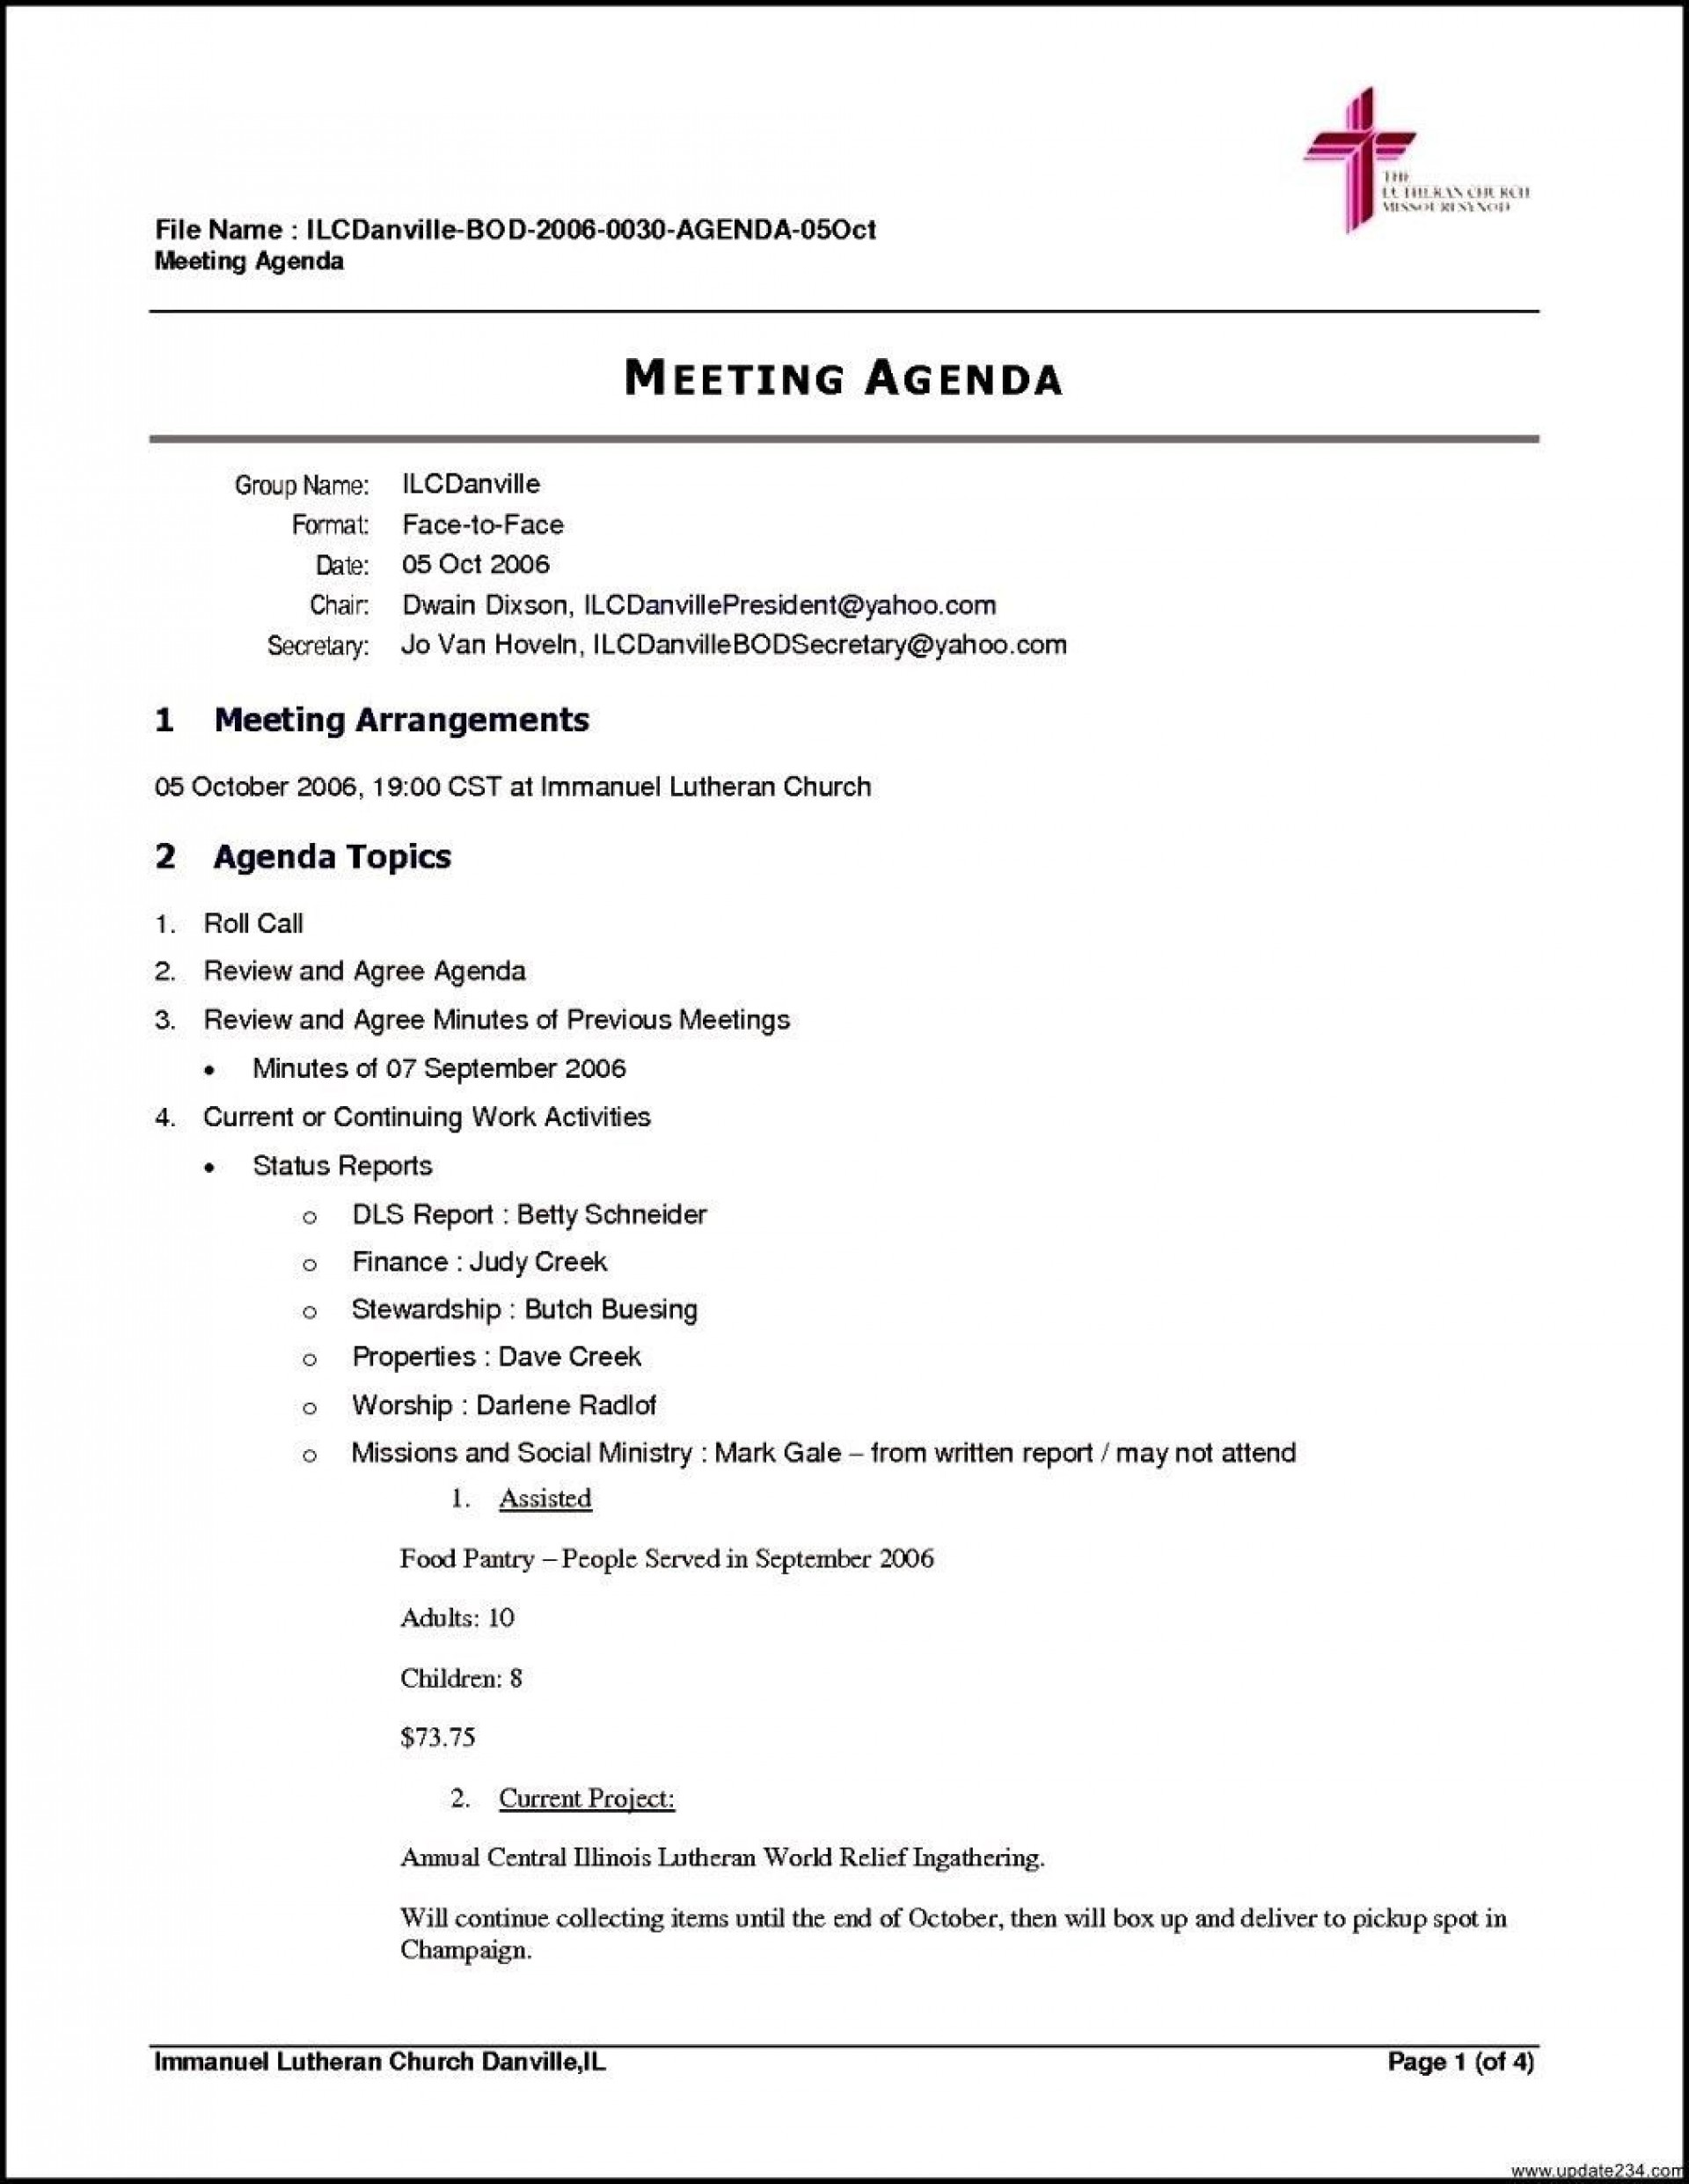 000 Archaicawful Meeting Agenda Template Free Design  Microsoft Word Board1920